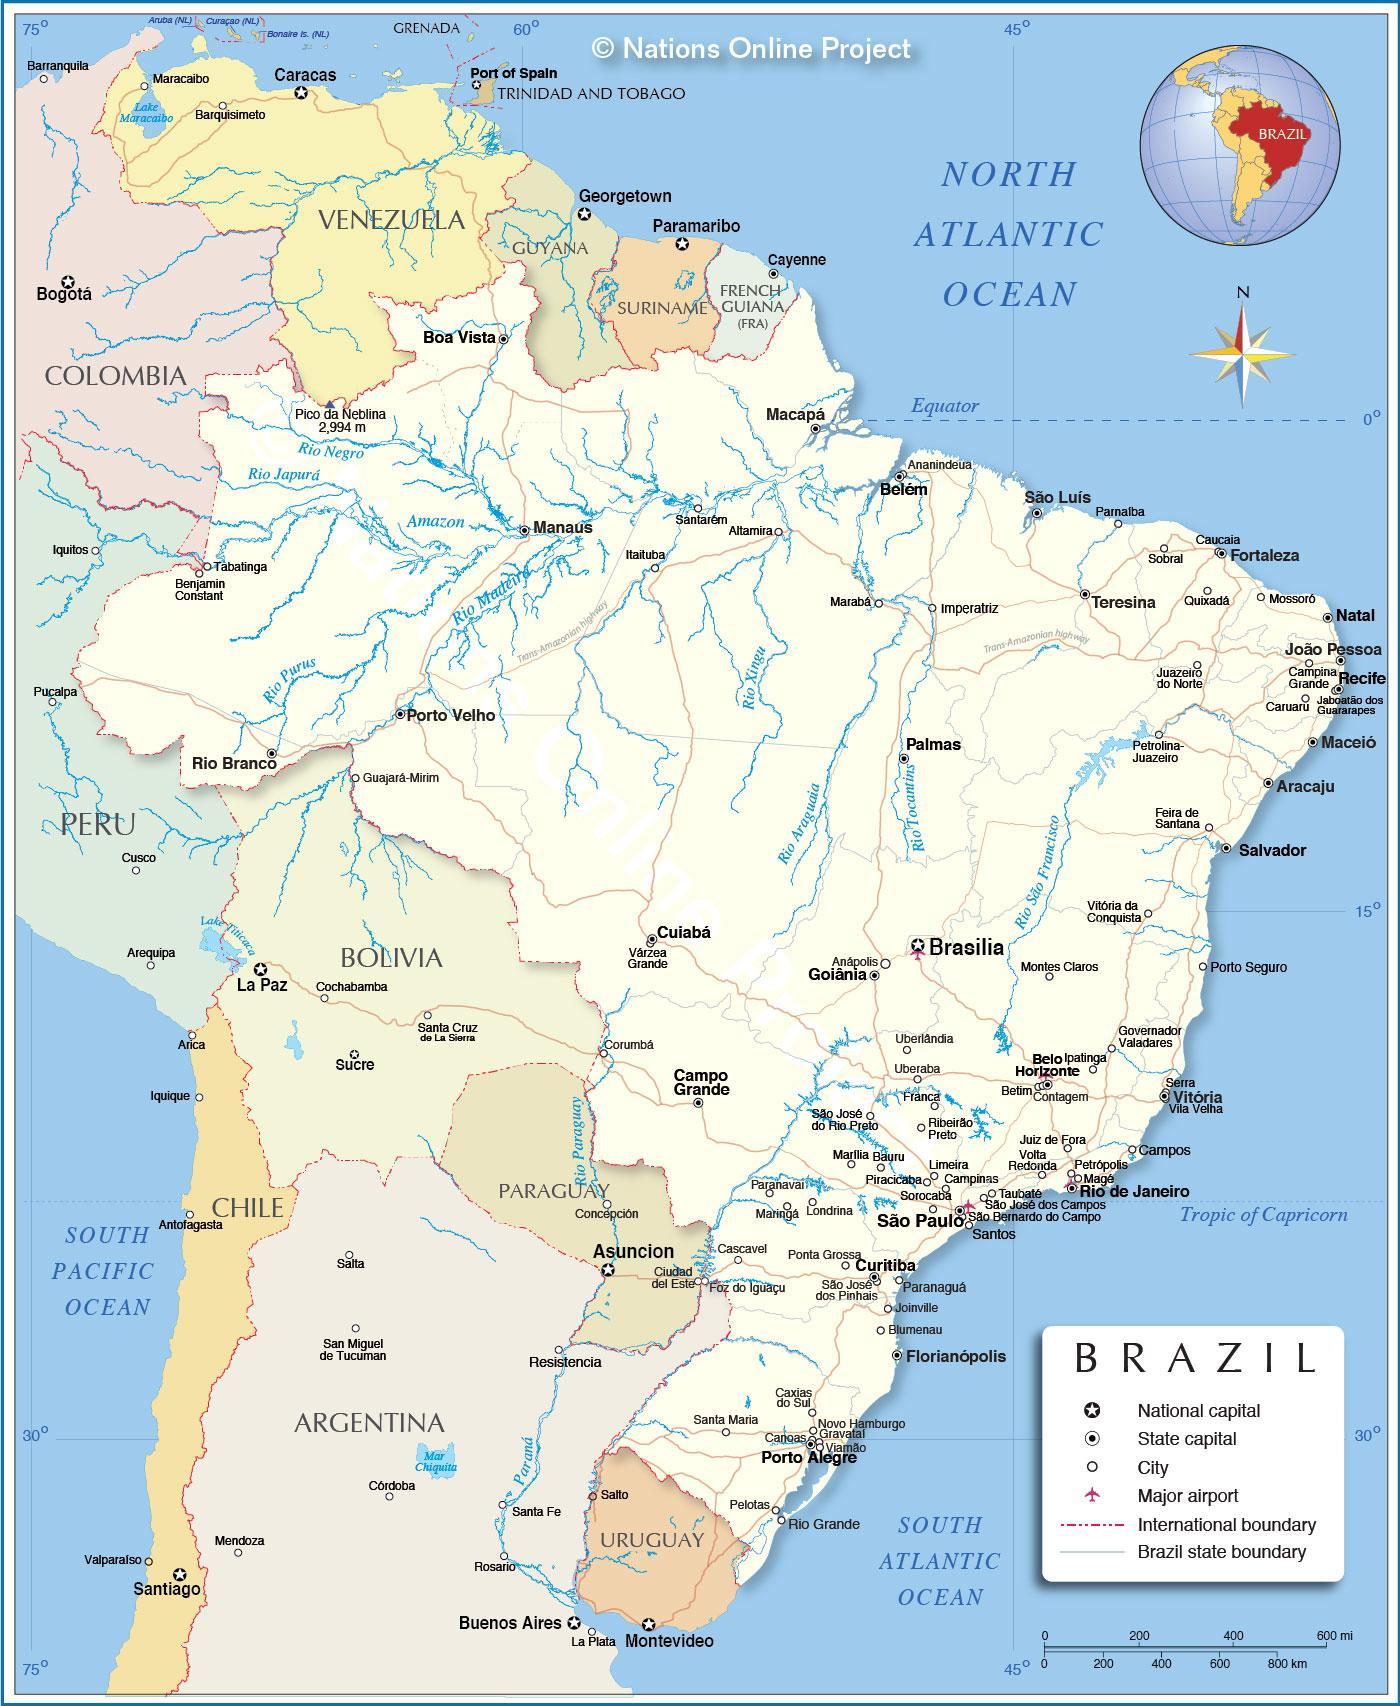 Brazil river map - Map of Brazil rivers (South America - Americas)